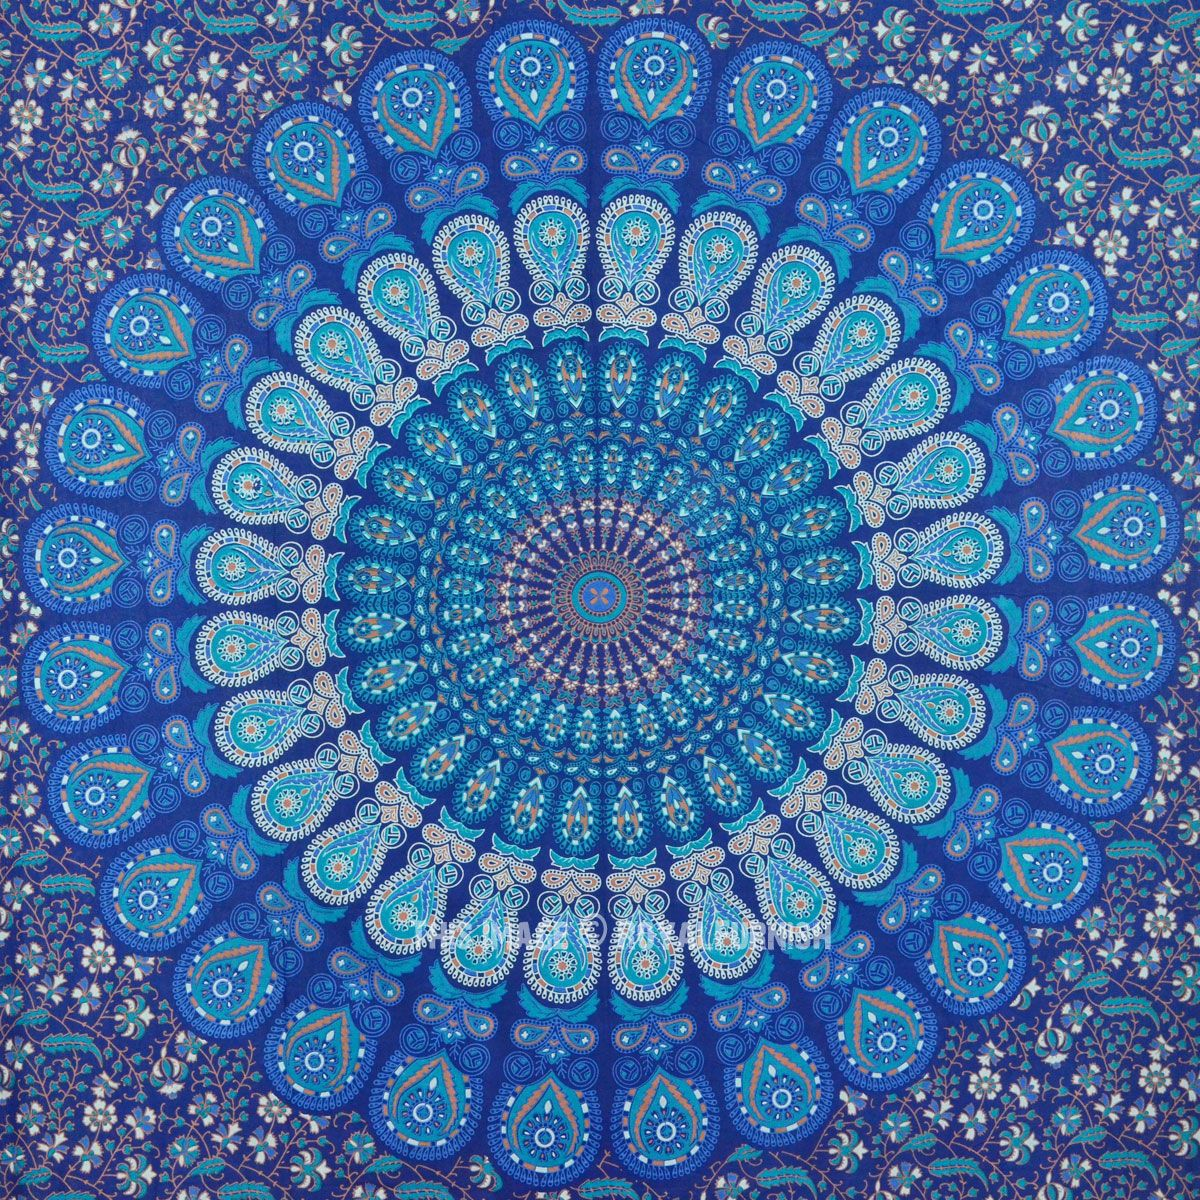 Blue multi elephants sun ombre mandala wall tapestry royalfurnish - Twin Indian Blue Hippie Mandala Tapestry Wall Hanging Boho Gypsy Decor Royalfurnish Com